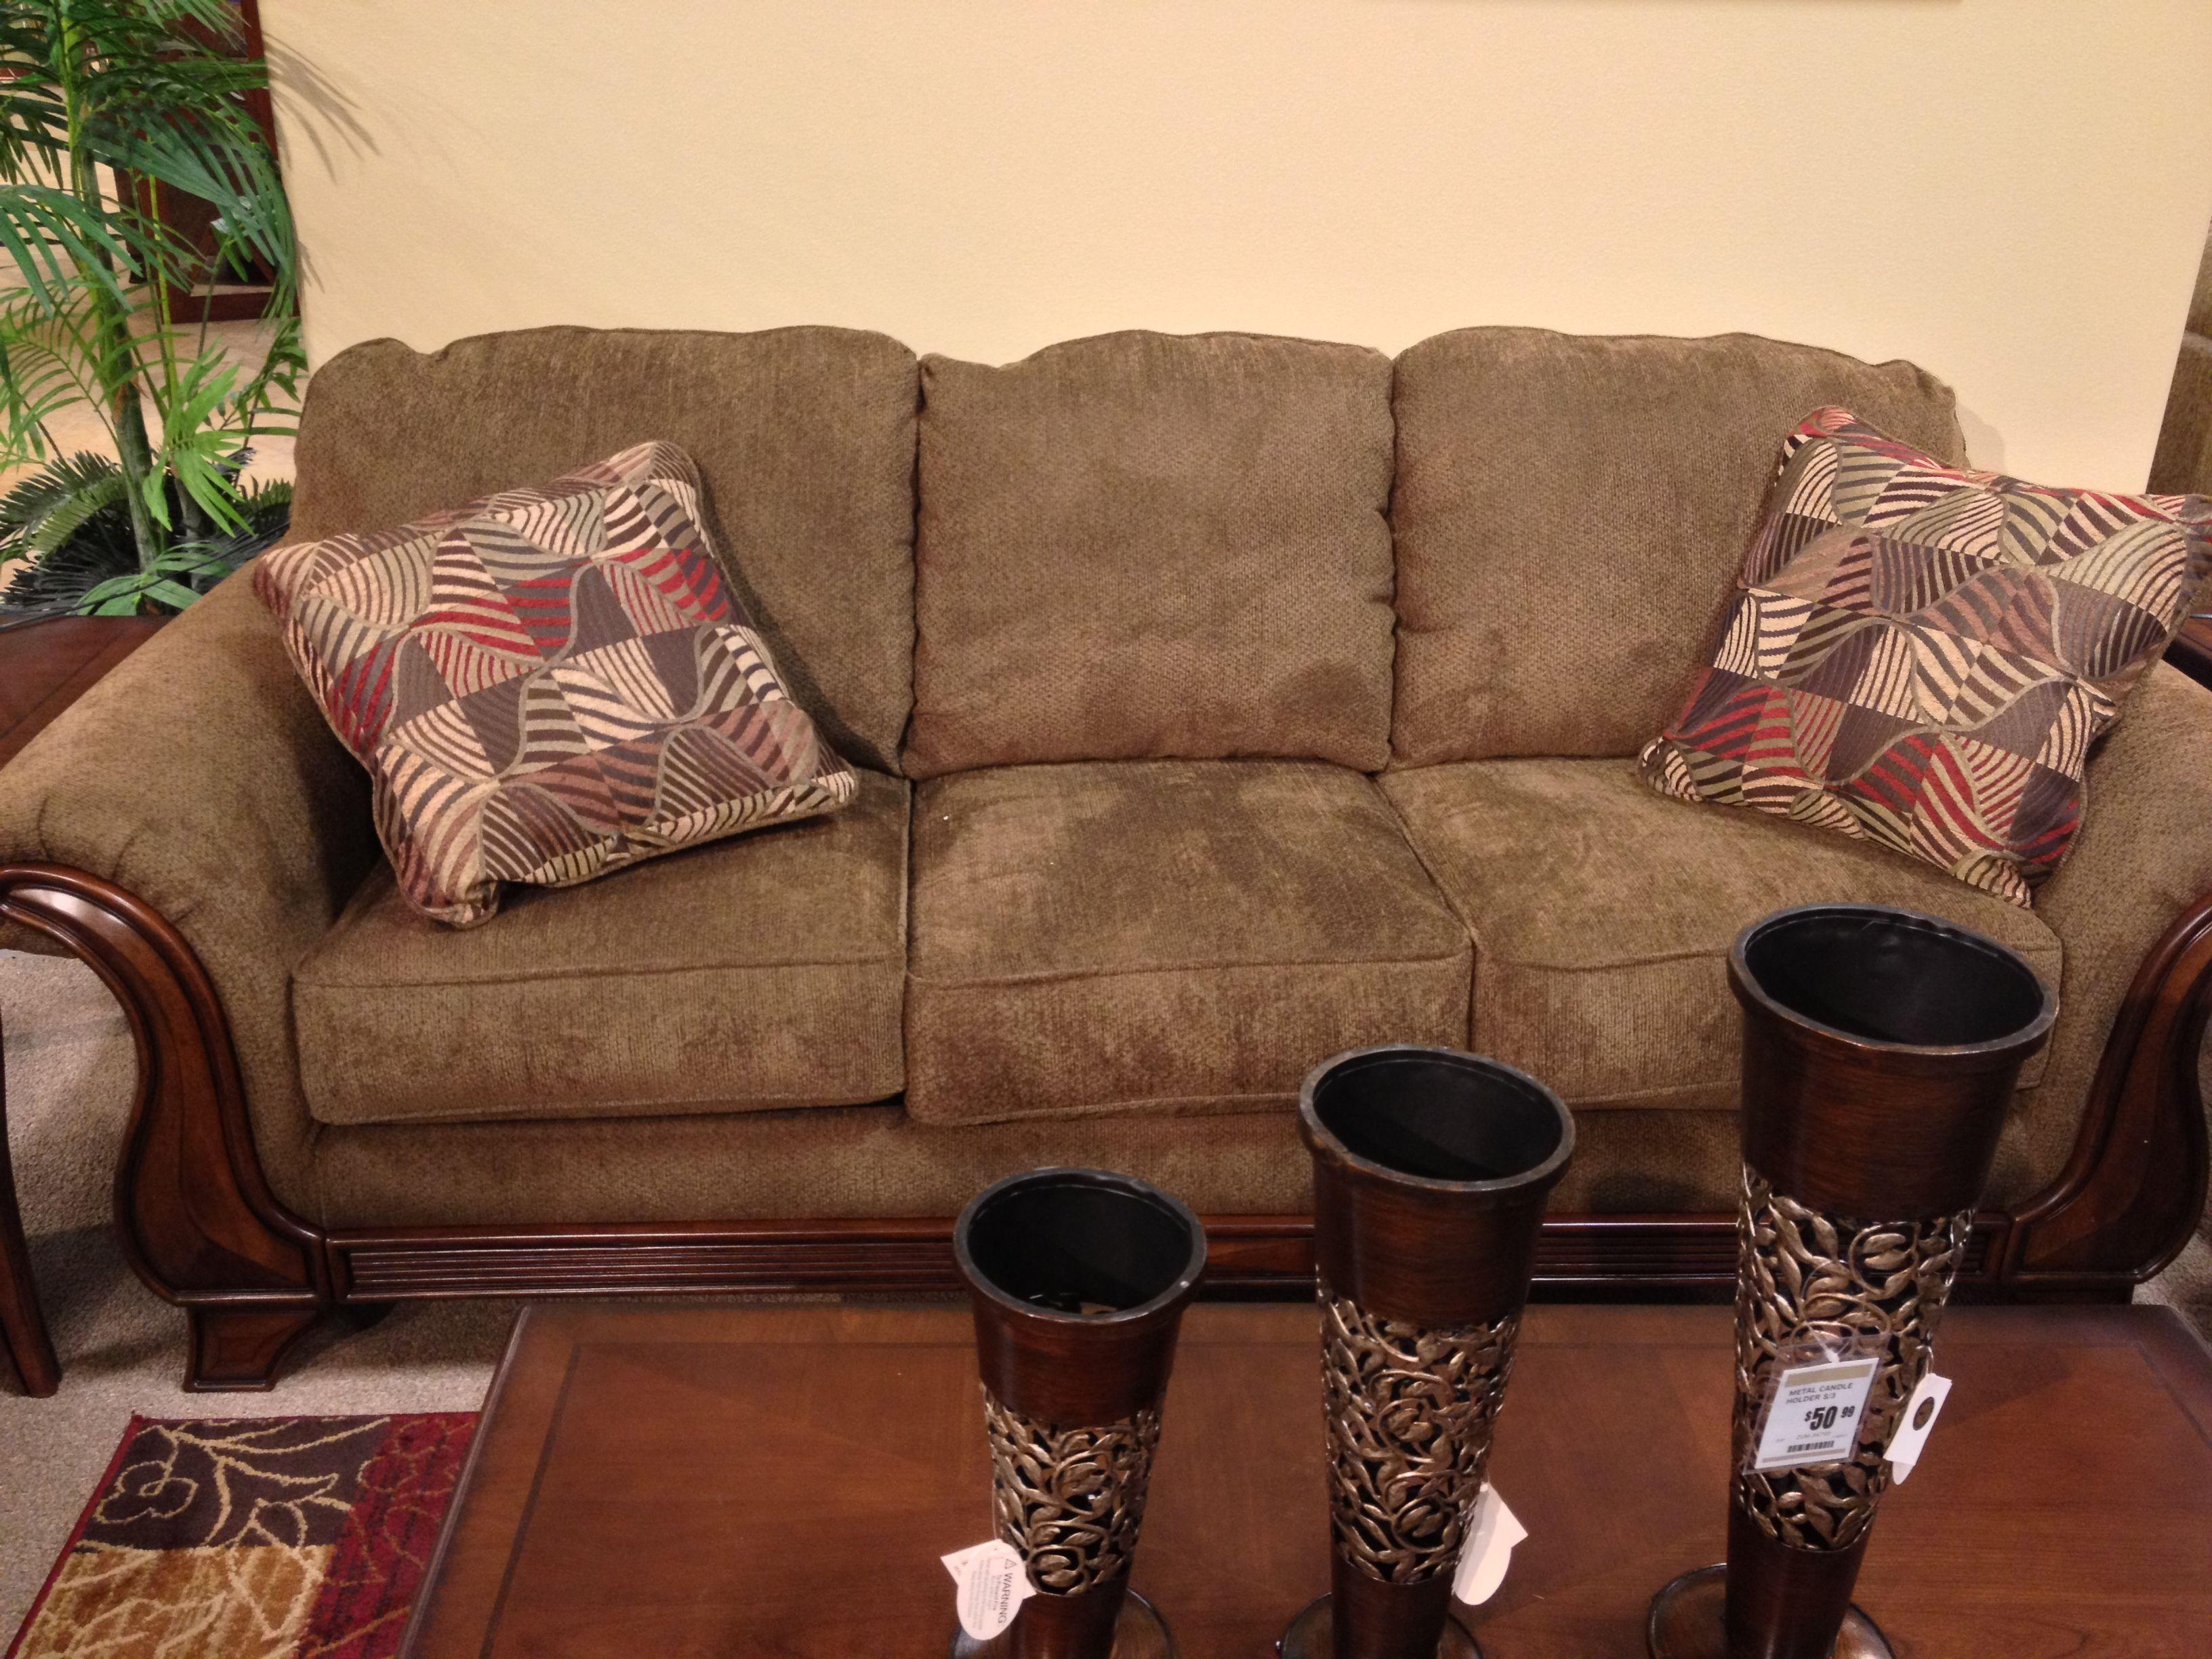 navasota charcoal sofa ashley furniture onde comprar sofas baratos em portugal montgomery mocha at in tricities